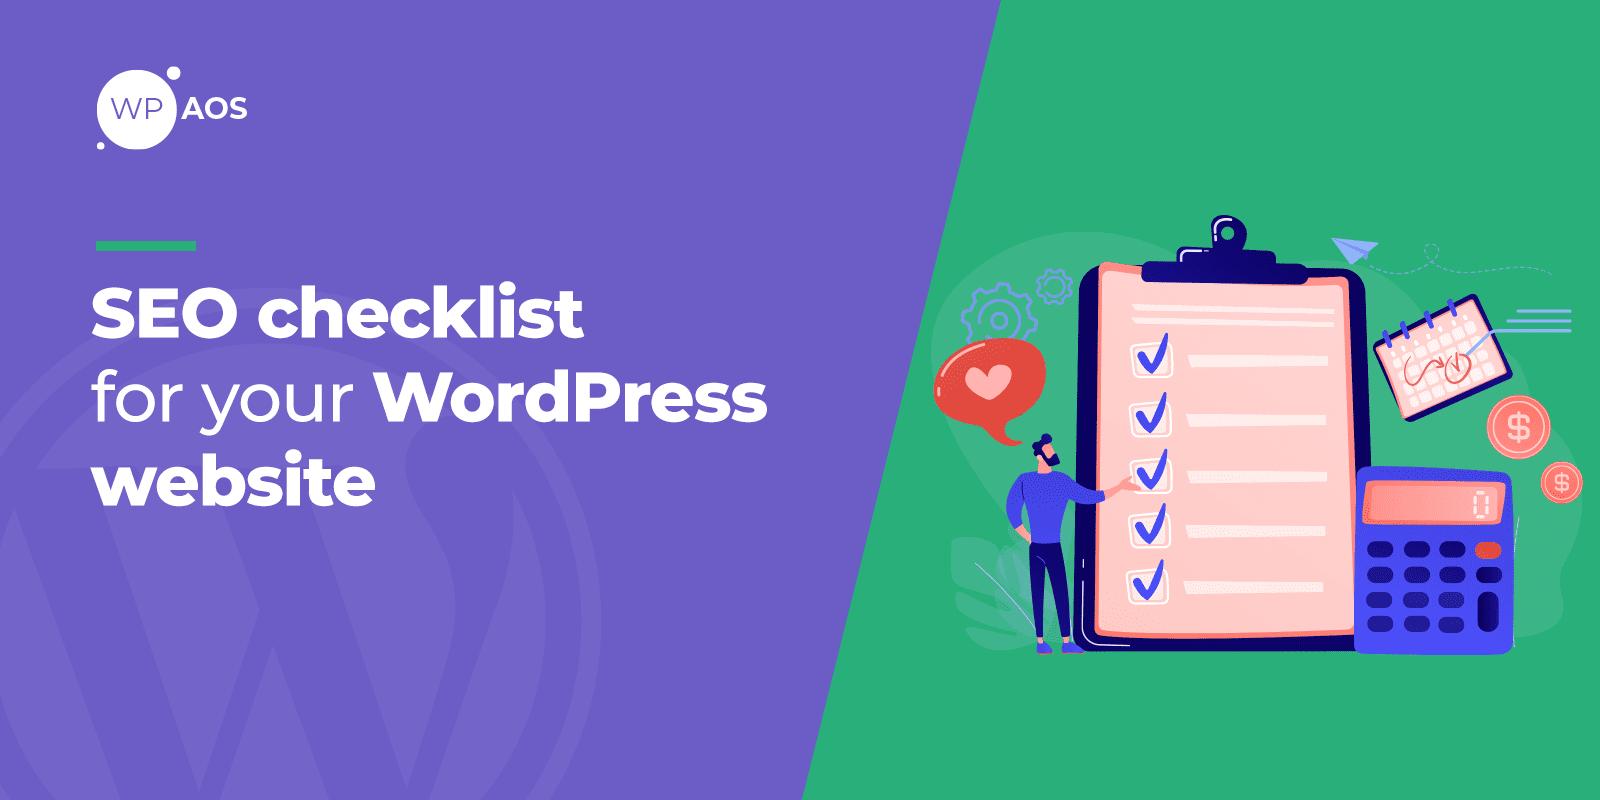 WordPress SEO checklist, website search engine optimization, wpaos